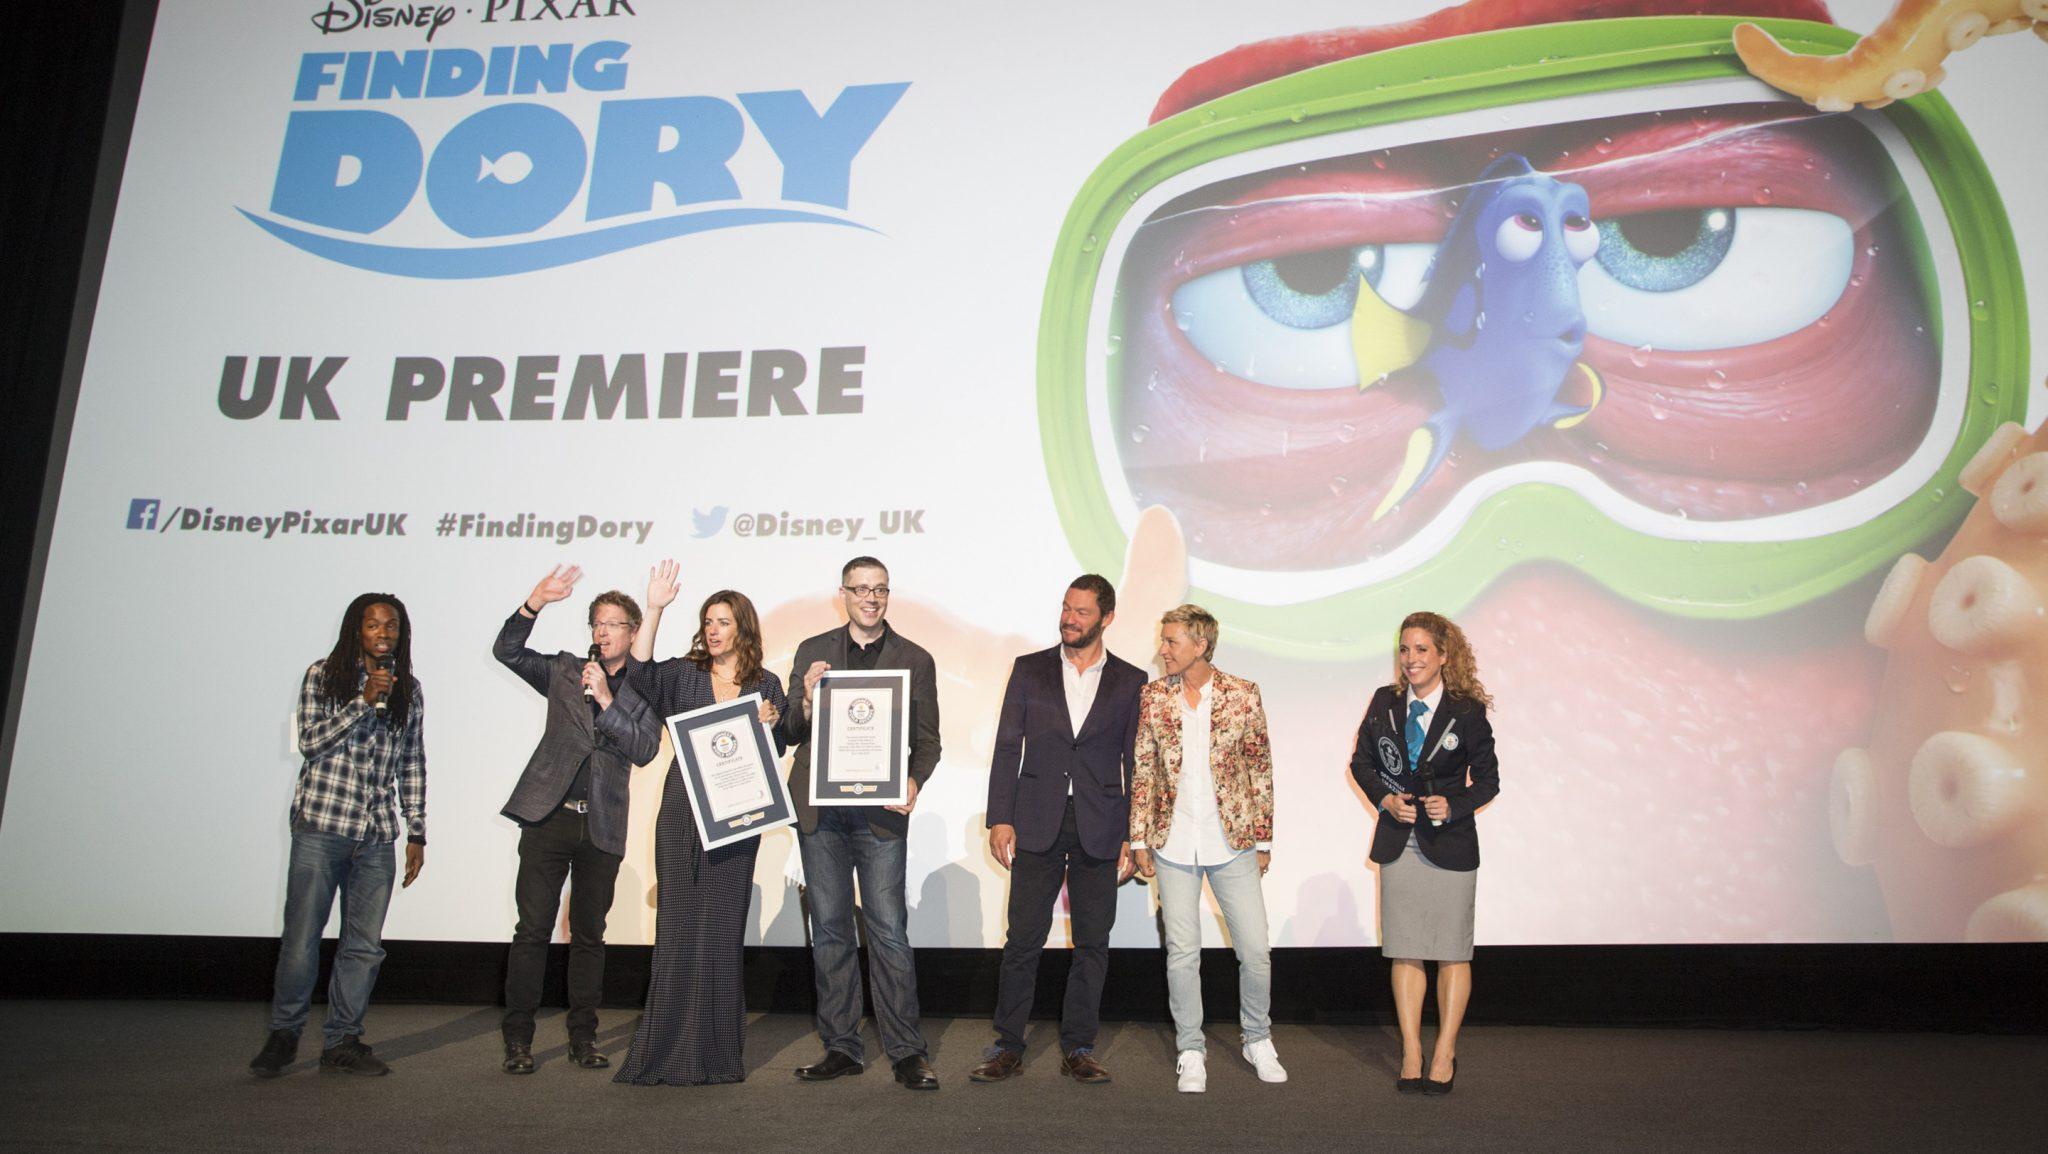 Nigel Clarke, Andrew Stanton, Dominic West, Ellen DeGeneres receiving a Guinness World record certificate at the Finding Dory UK Premiere